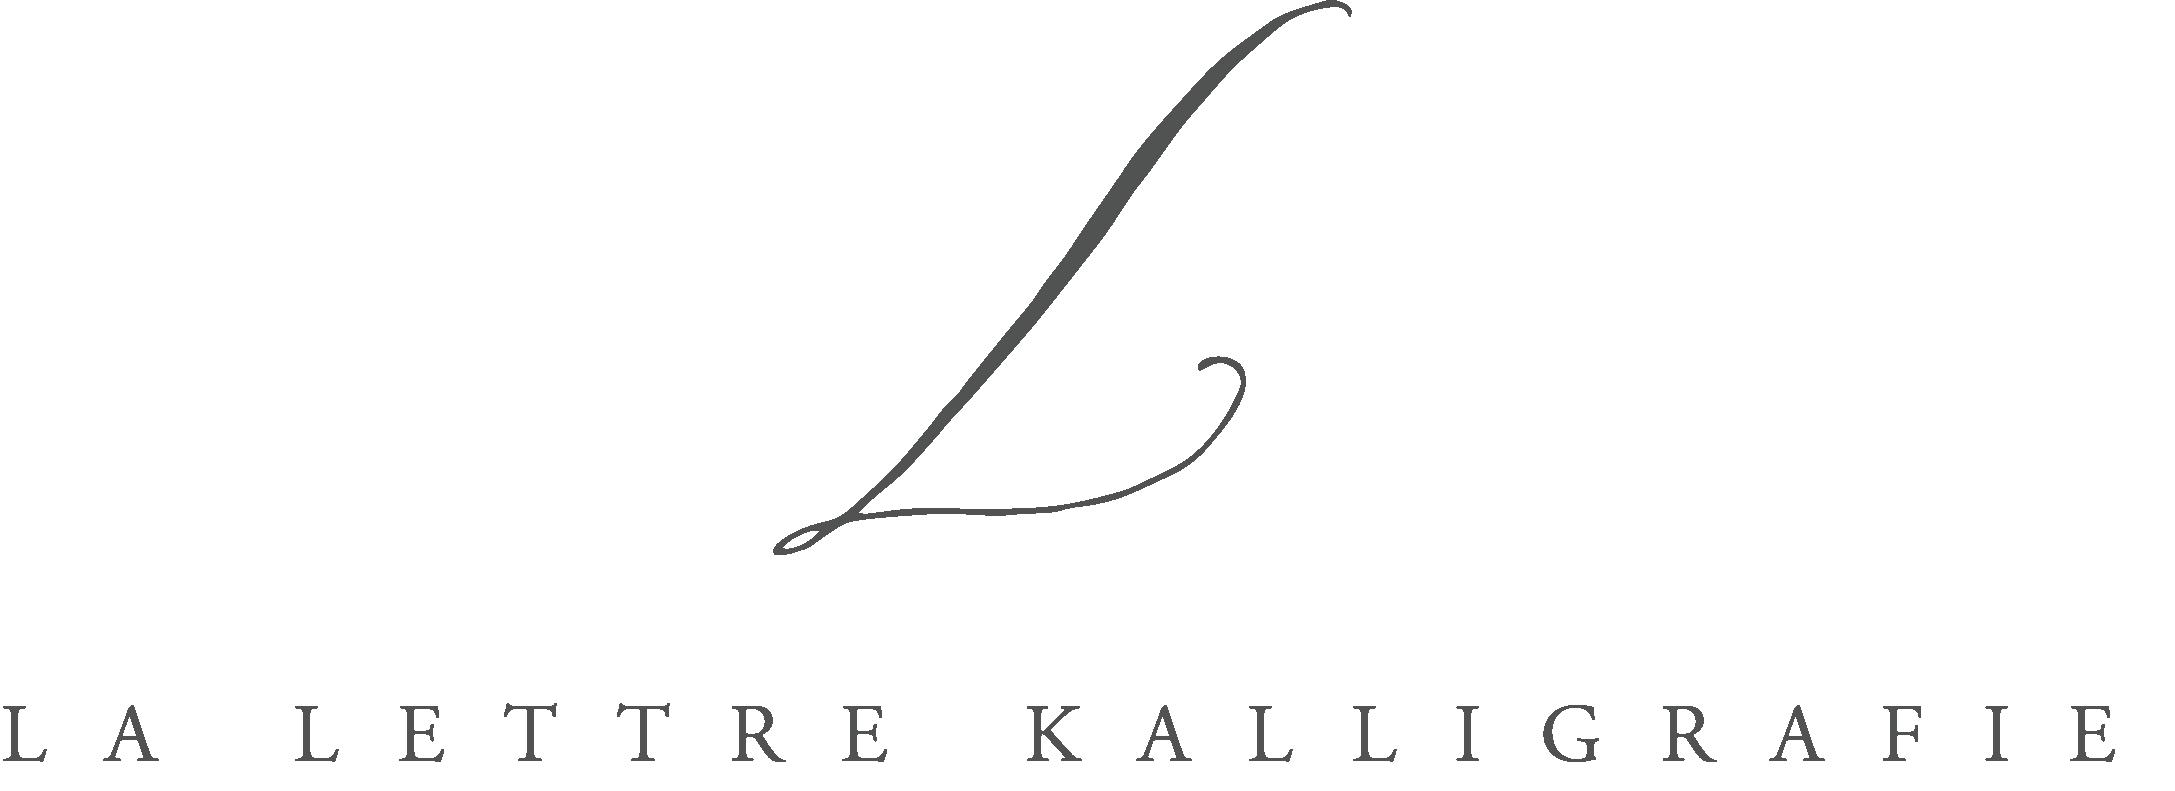 La Lettre Kalligrafie